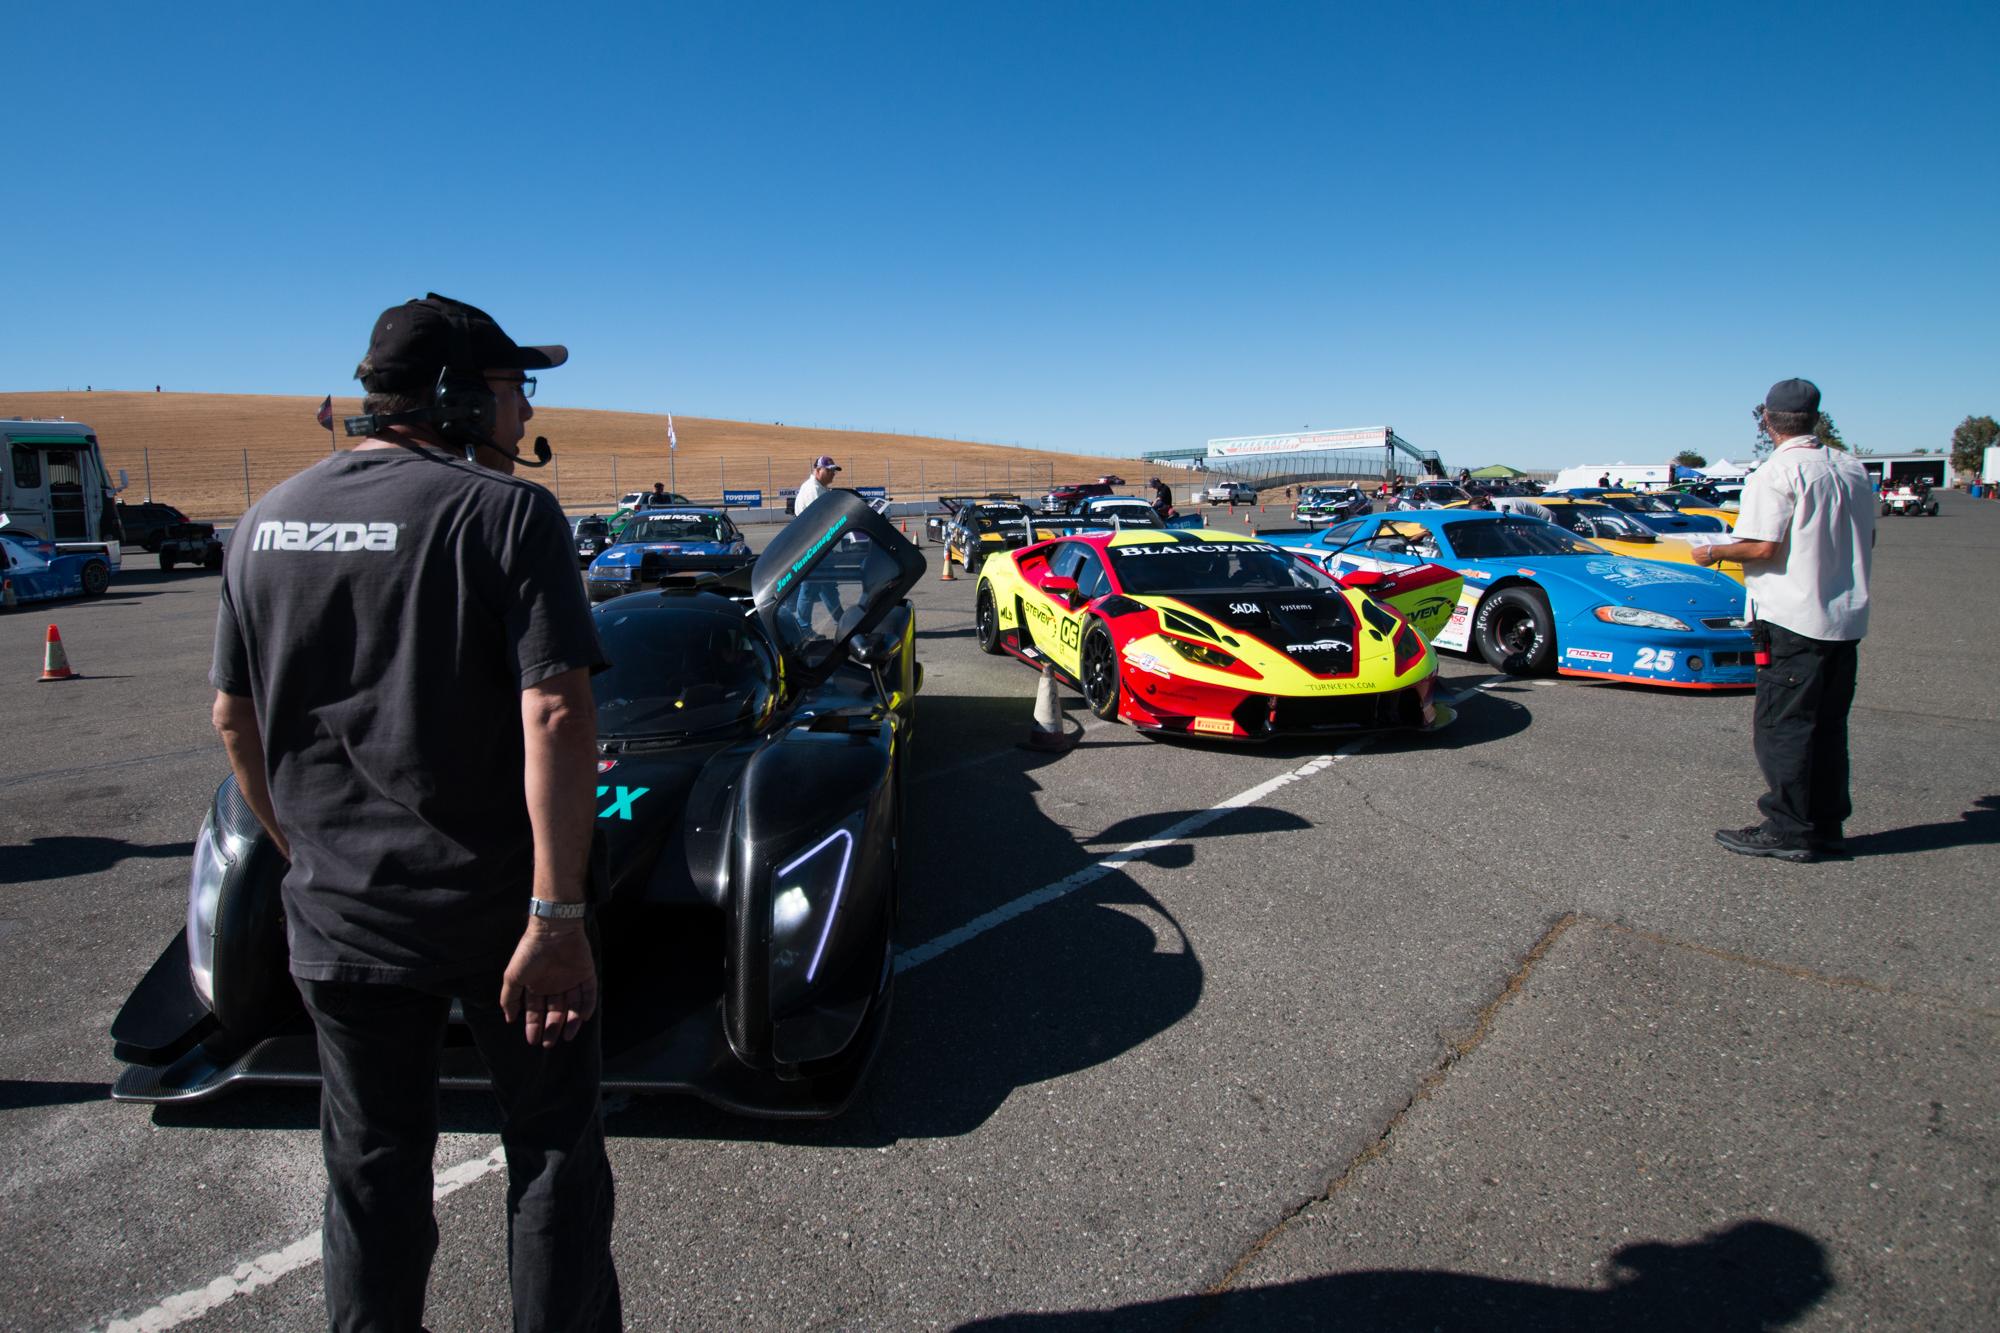 Steven-Racing-20130206-44818.jpg